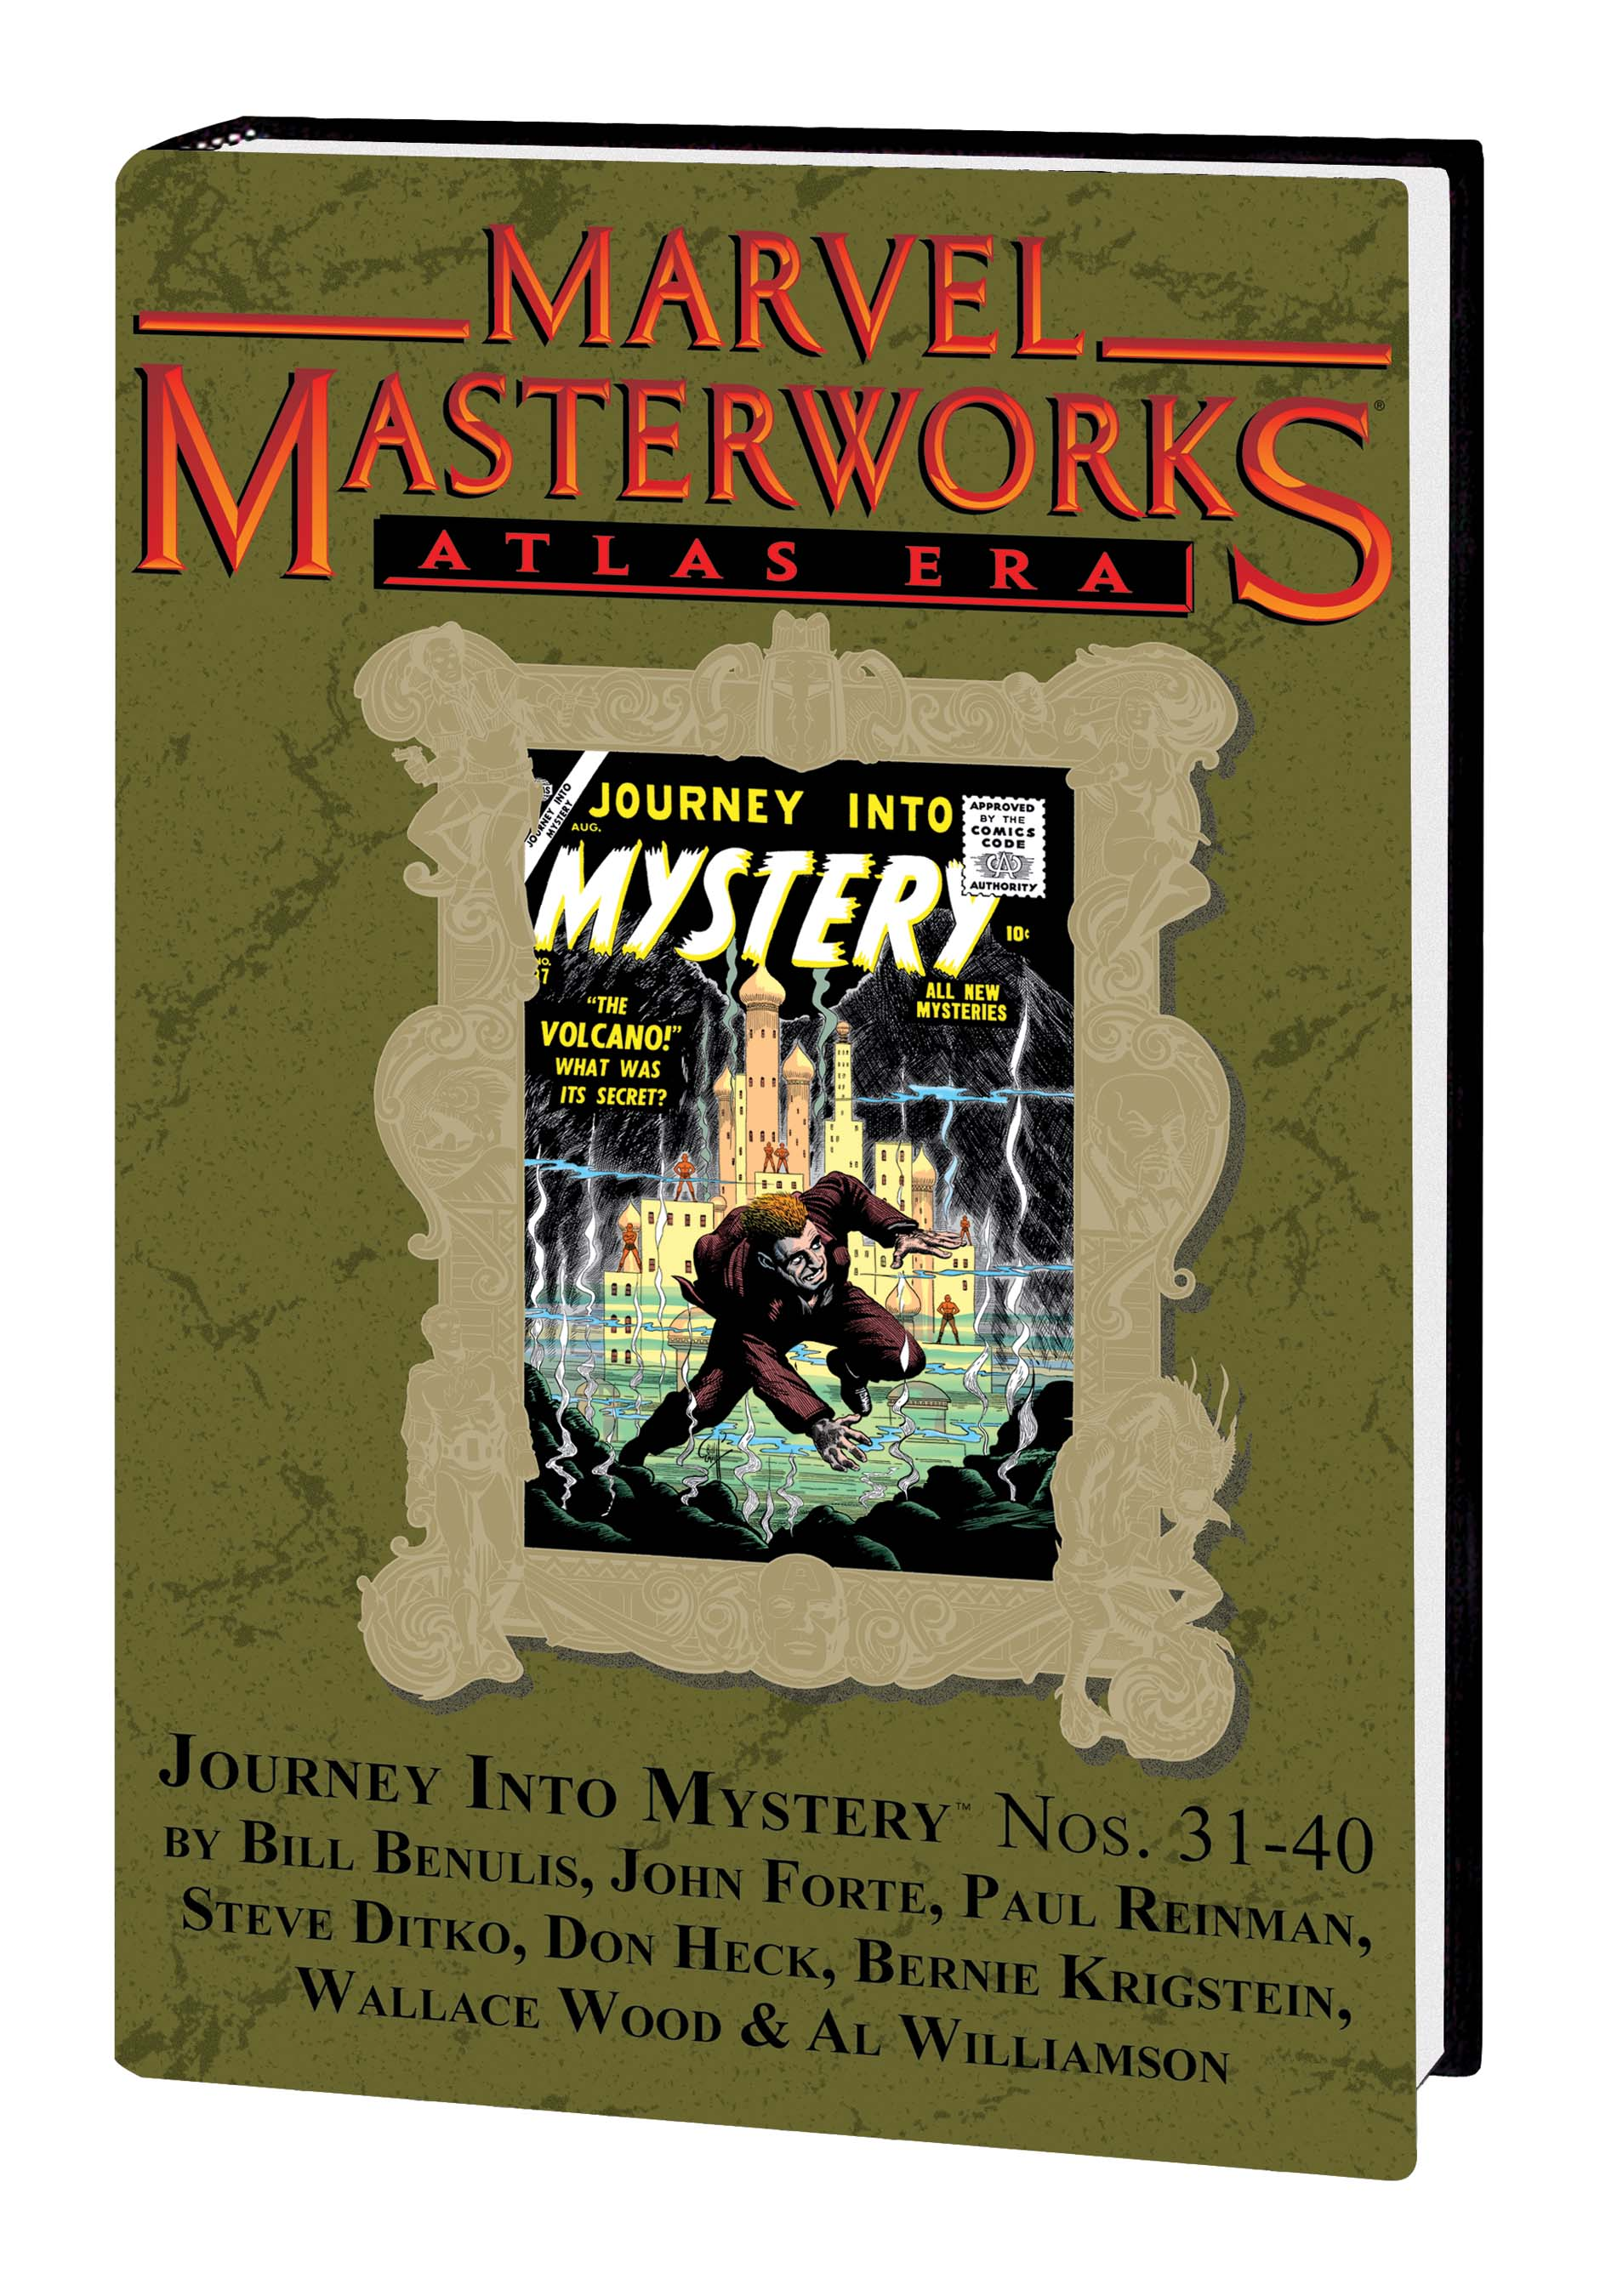 Marvel Masterworks: Atlas Era Journey Into Mystery (Hardcover)